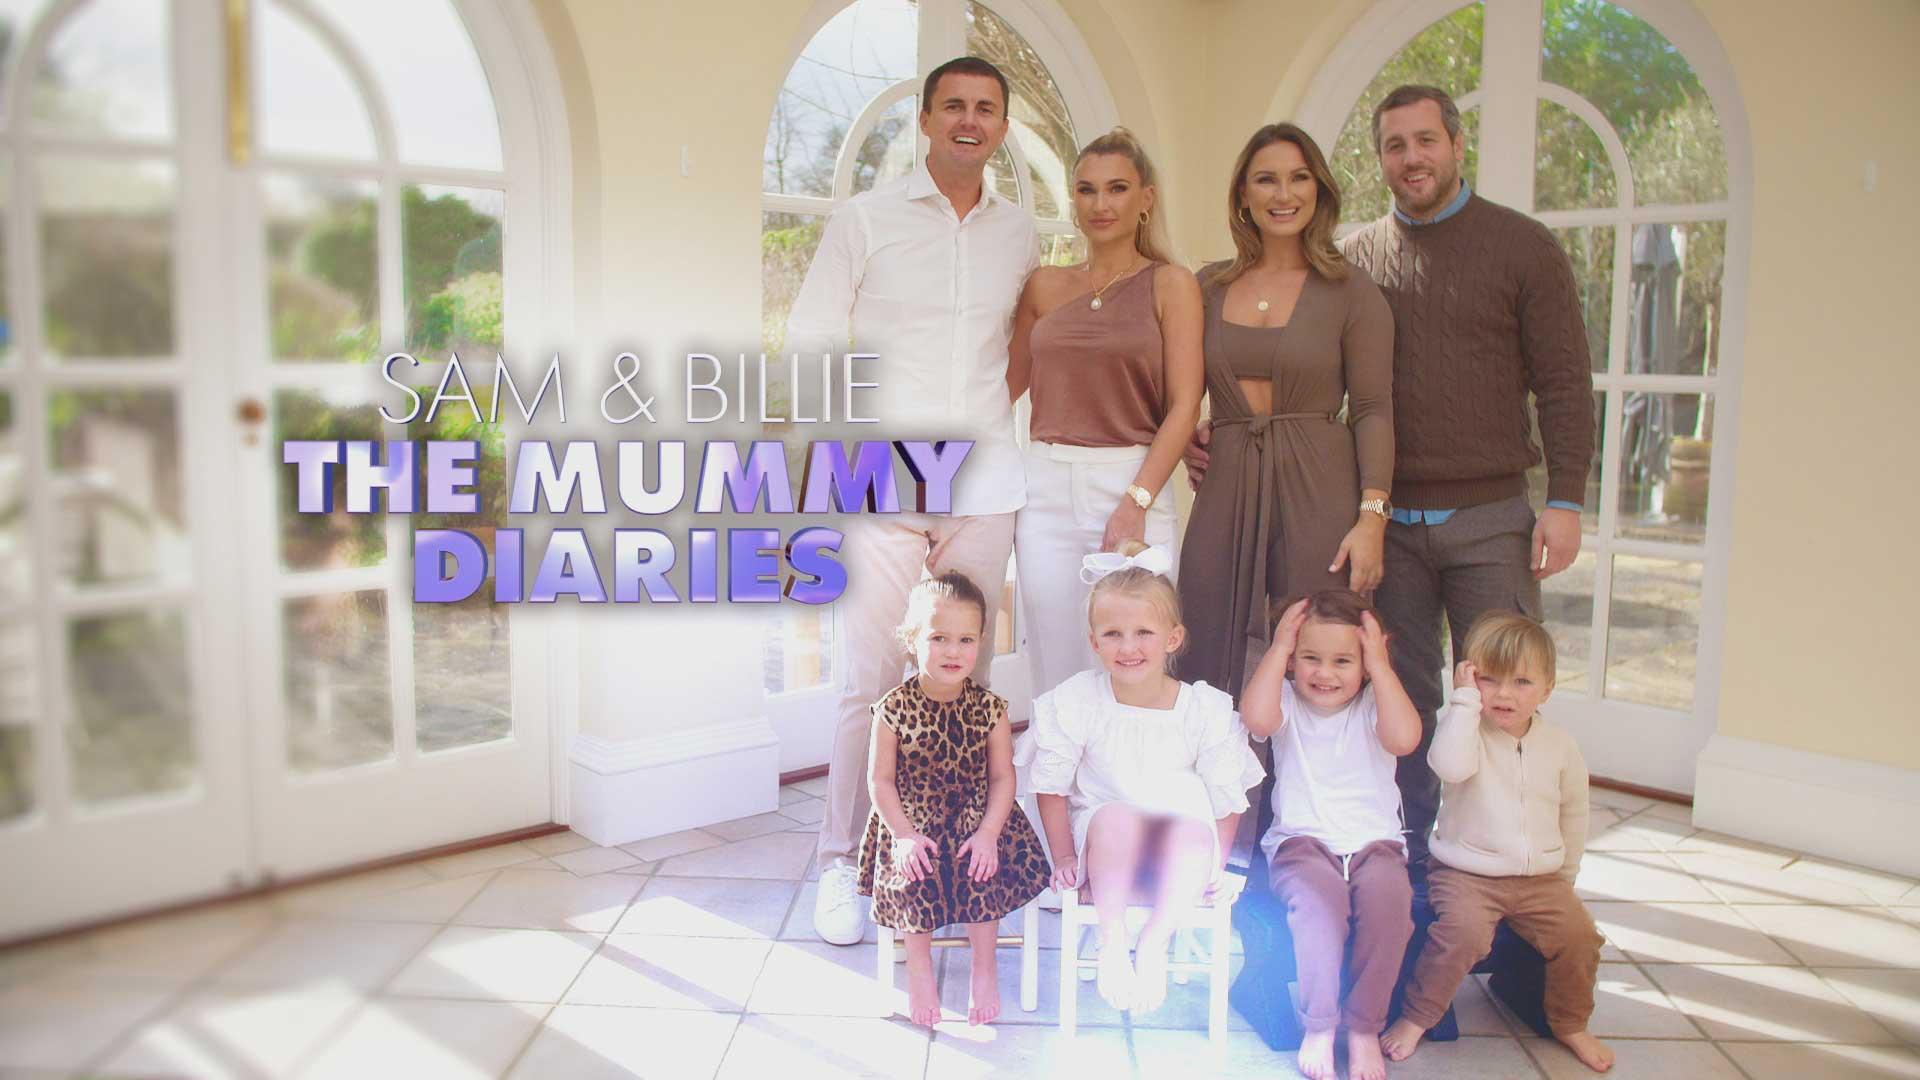 Sam & Billie: The Mummy Diaries (Series 7)